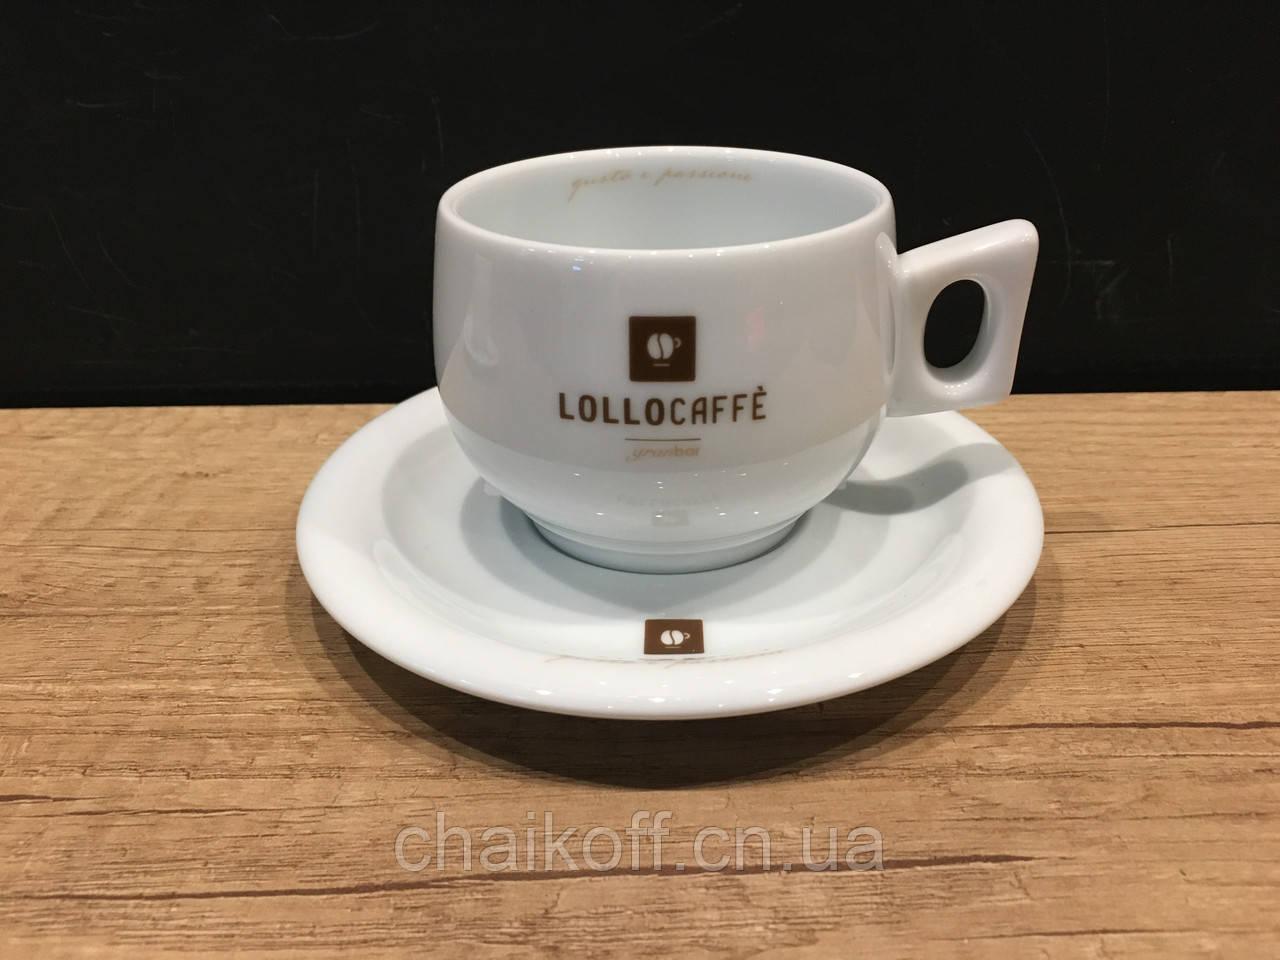 Чашка с блюдцем капучино фарфорLollo Caffe 150 мл.